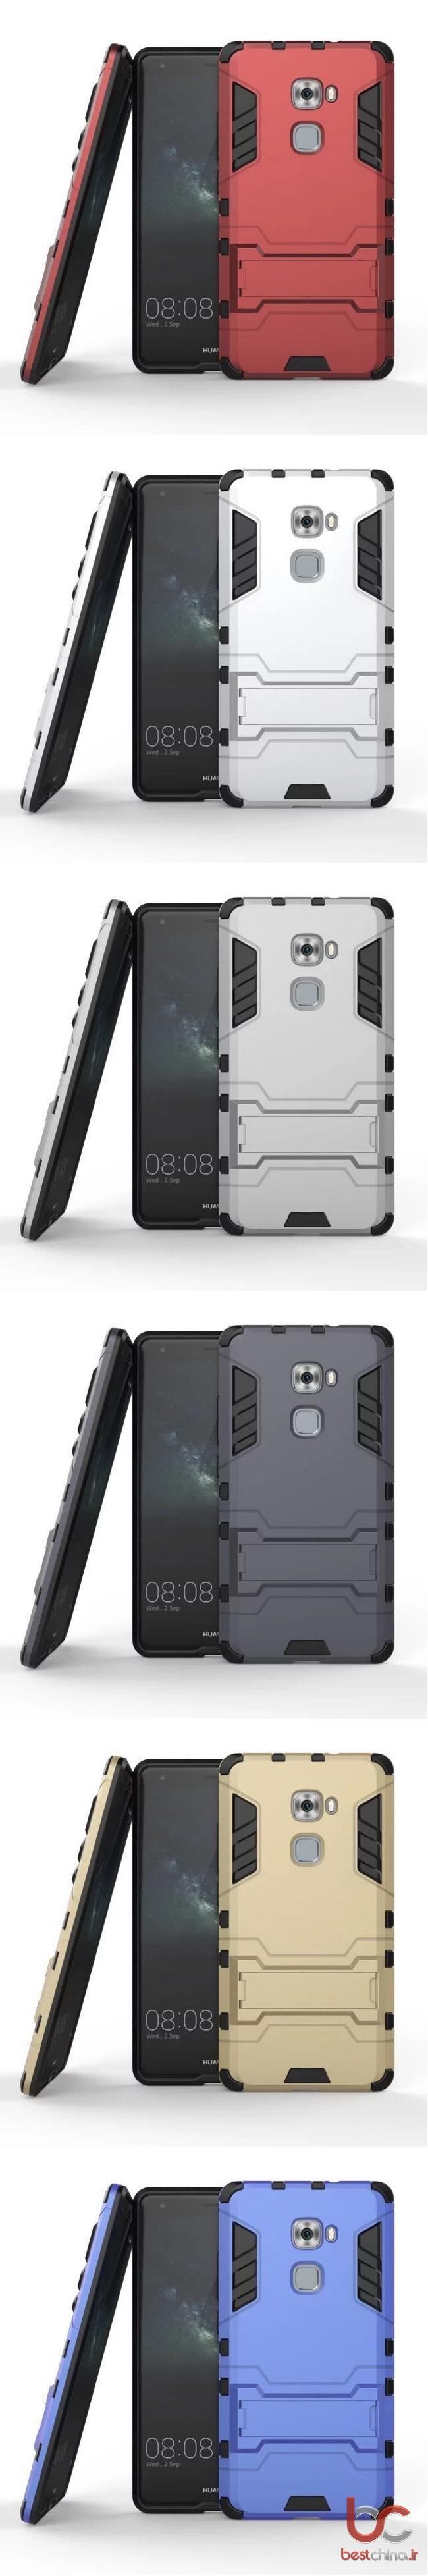 Huawei Mate S TPU Back Cover (2)